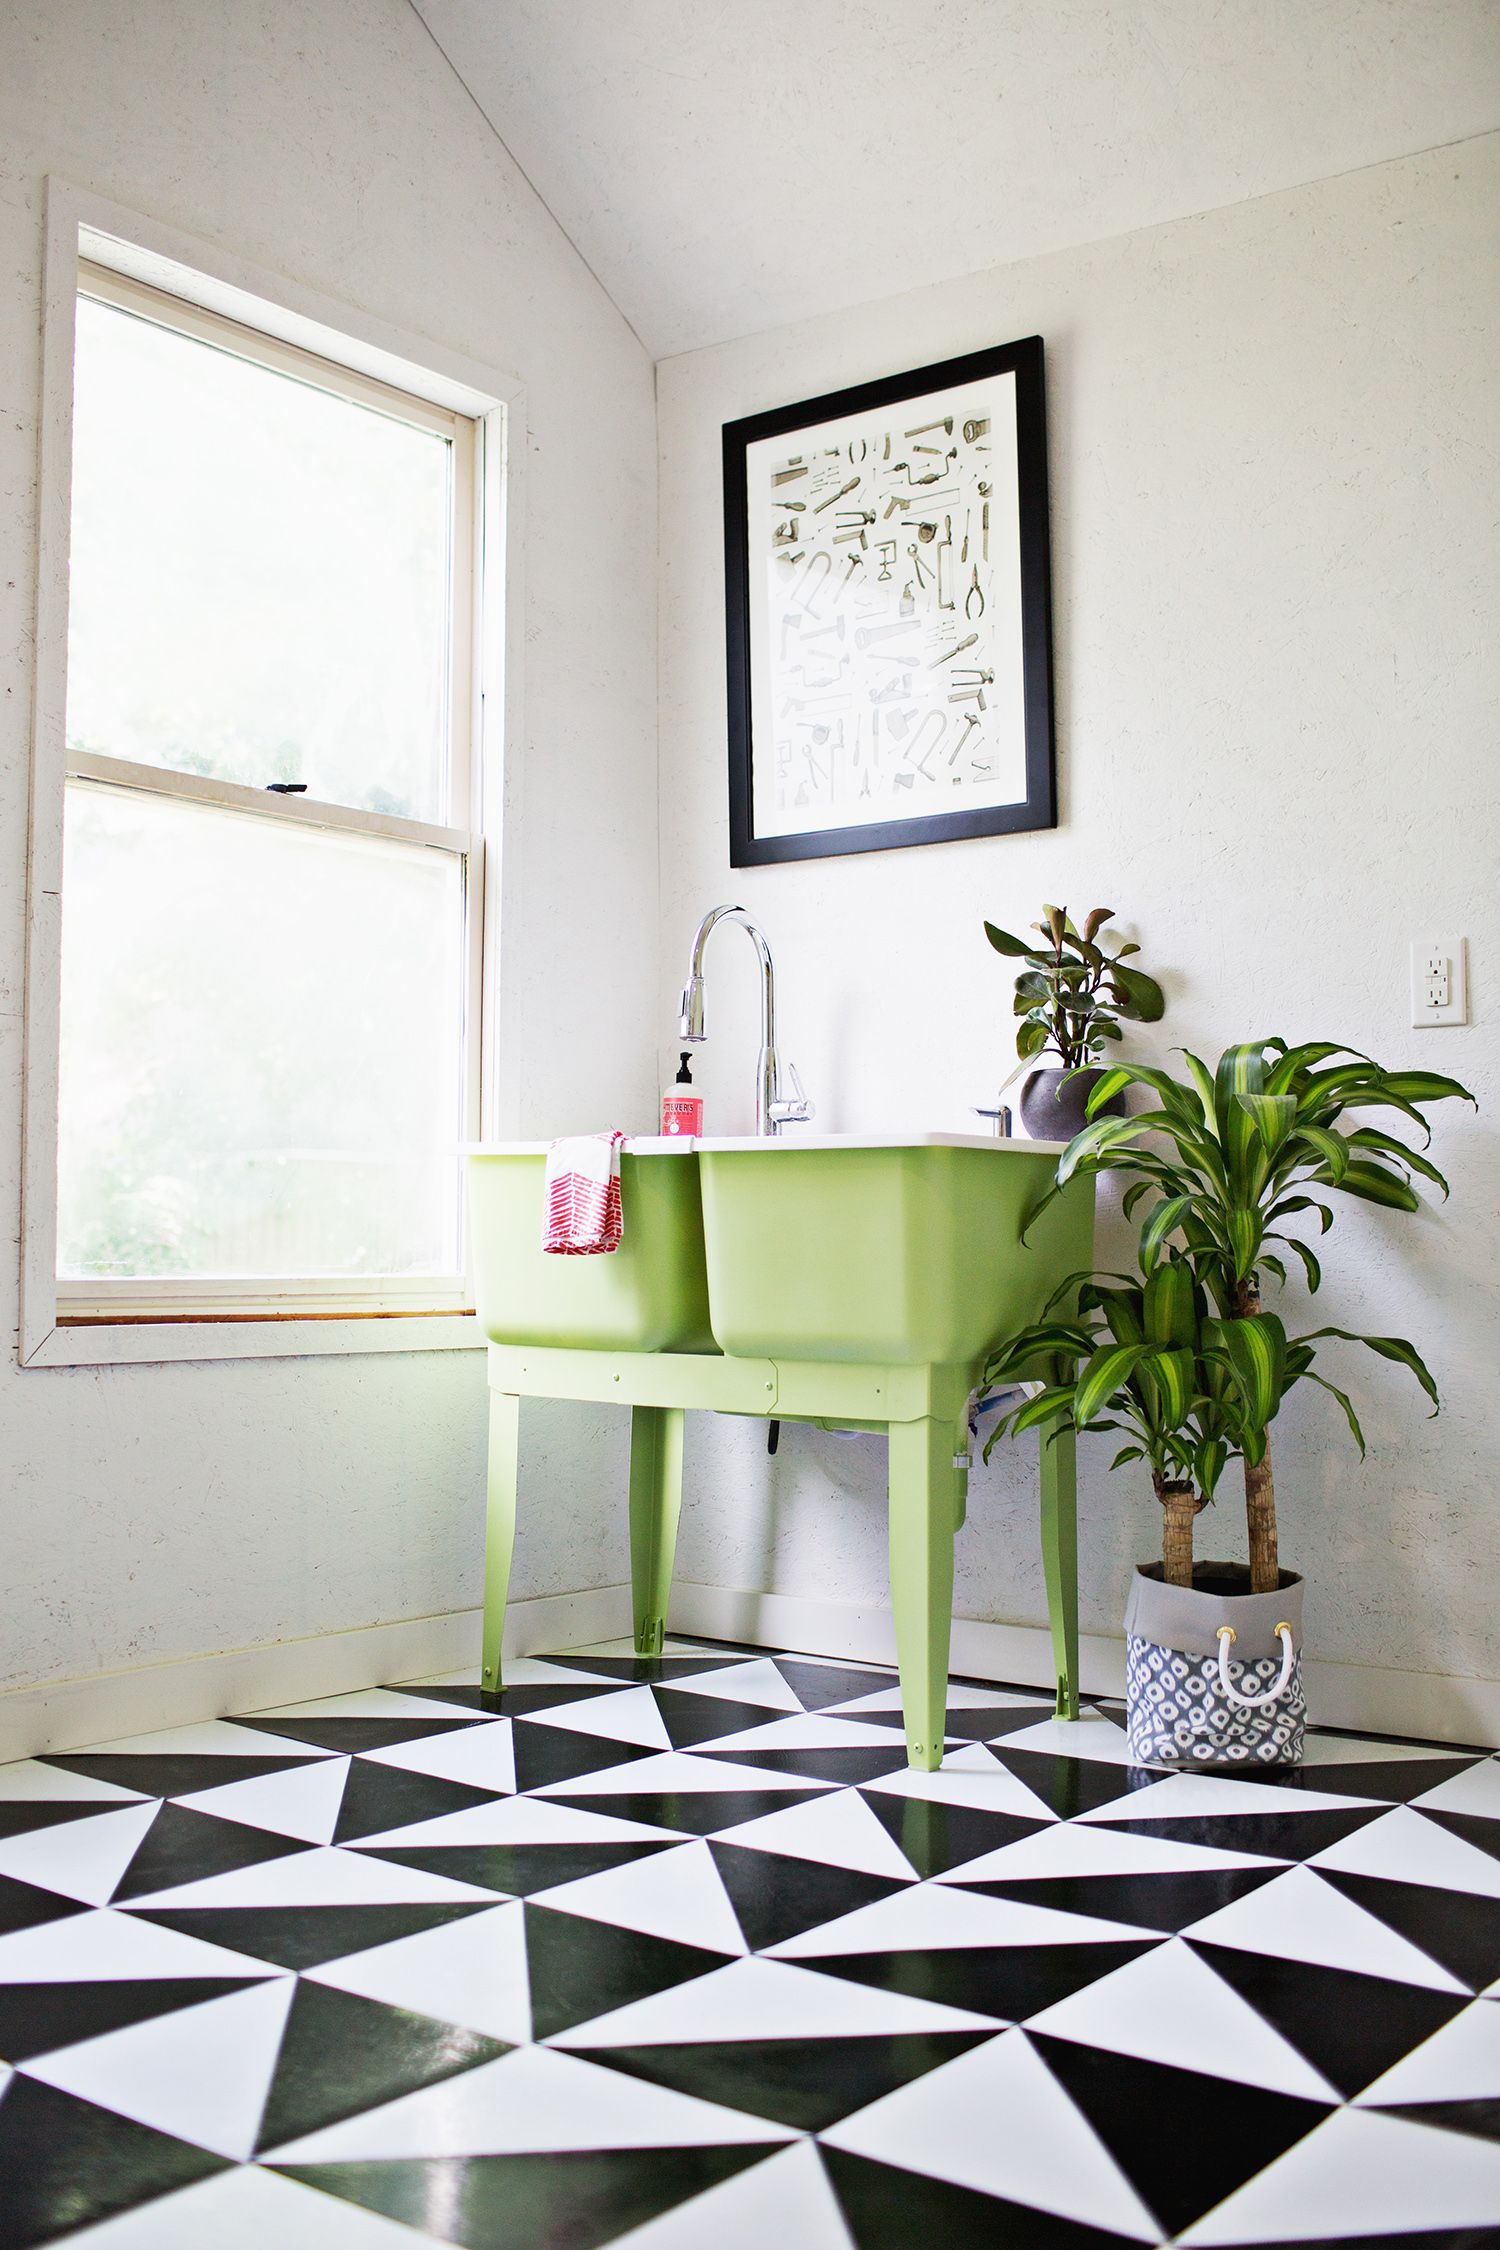 Make A Patterned Floor With Linoleum Tile | Pinterest | Utility ...